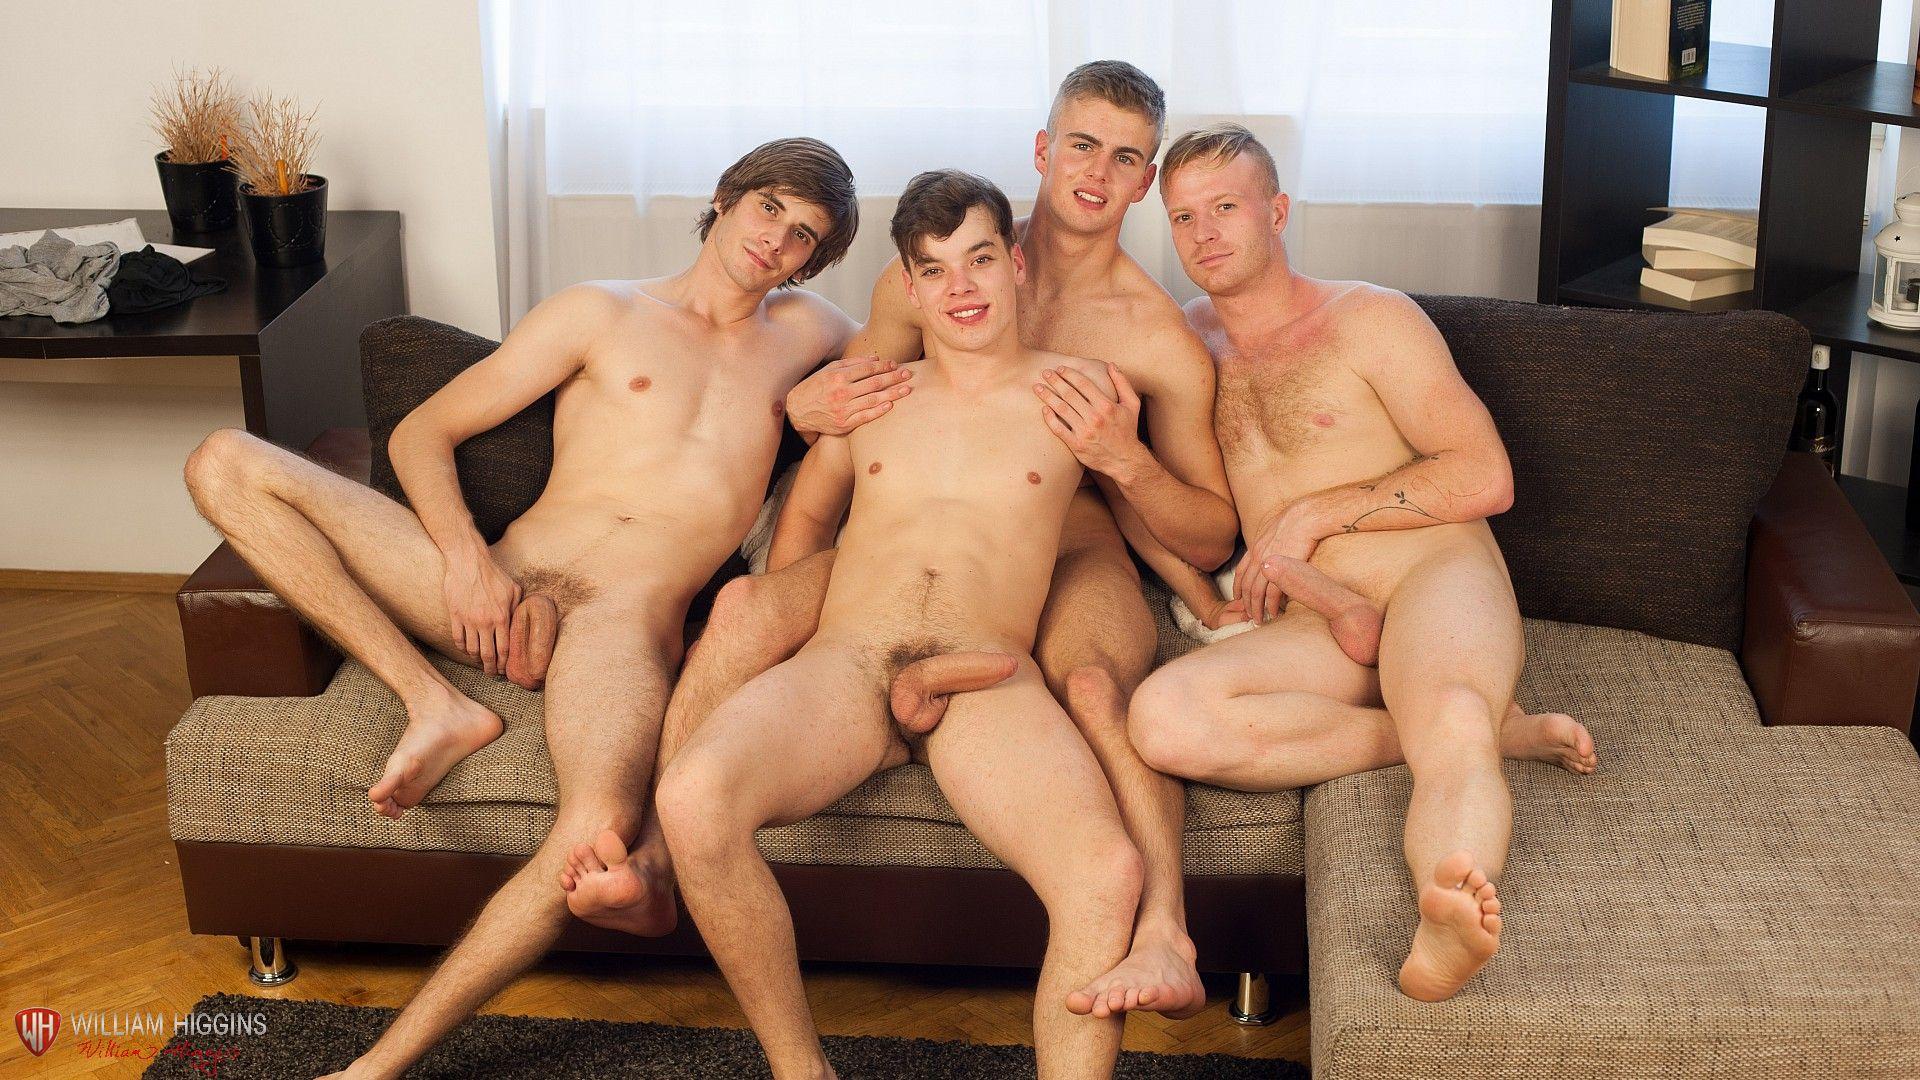 Gay porn william higgins models